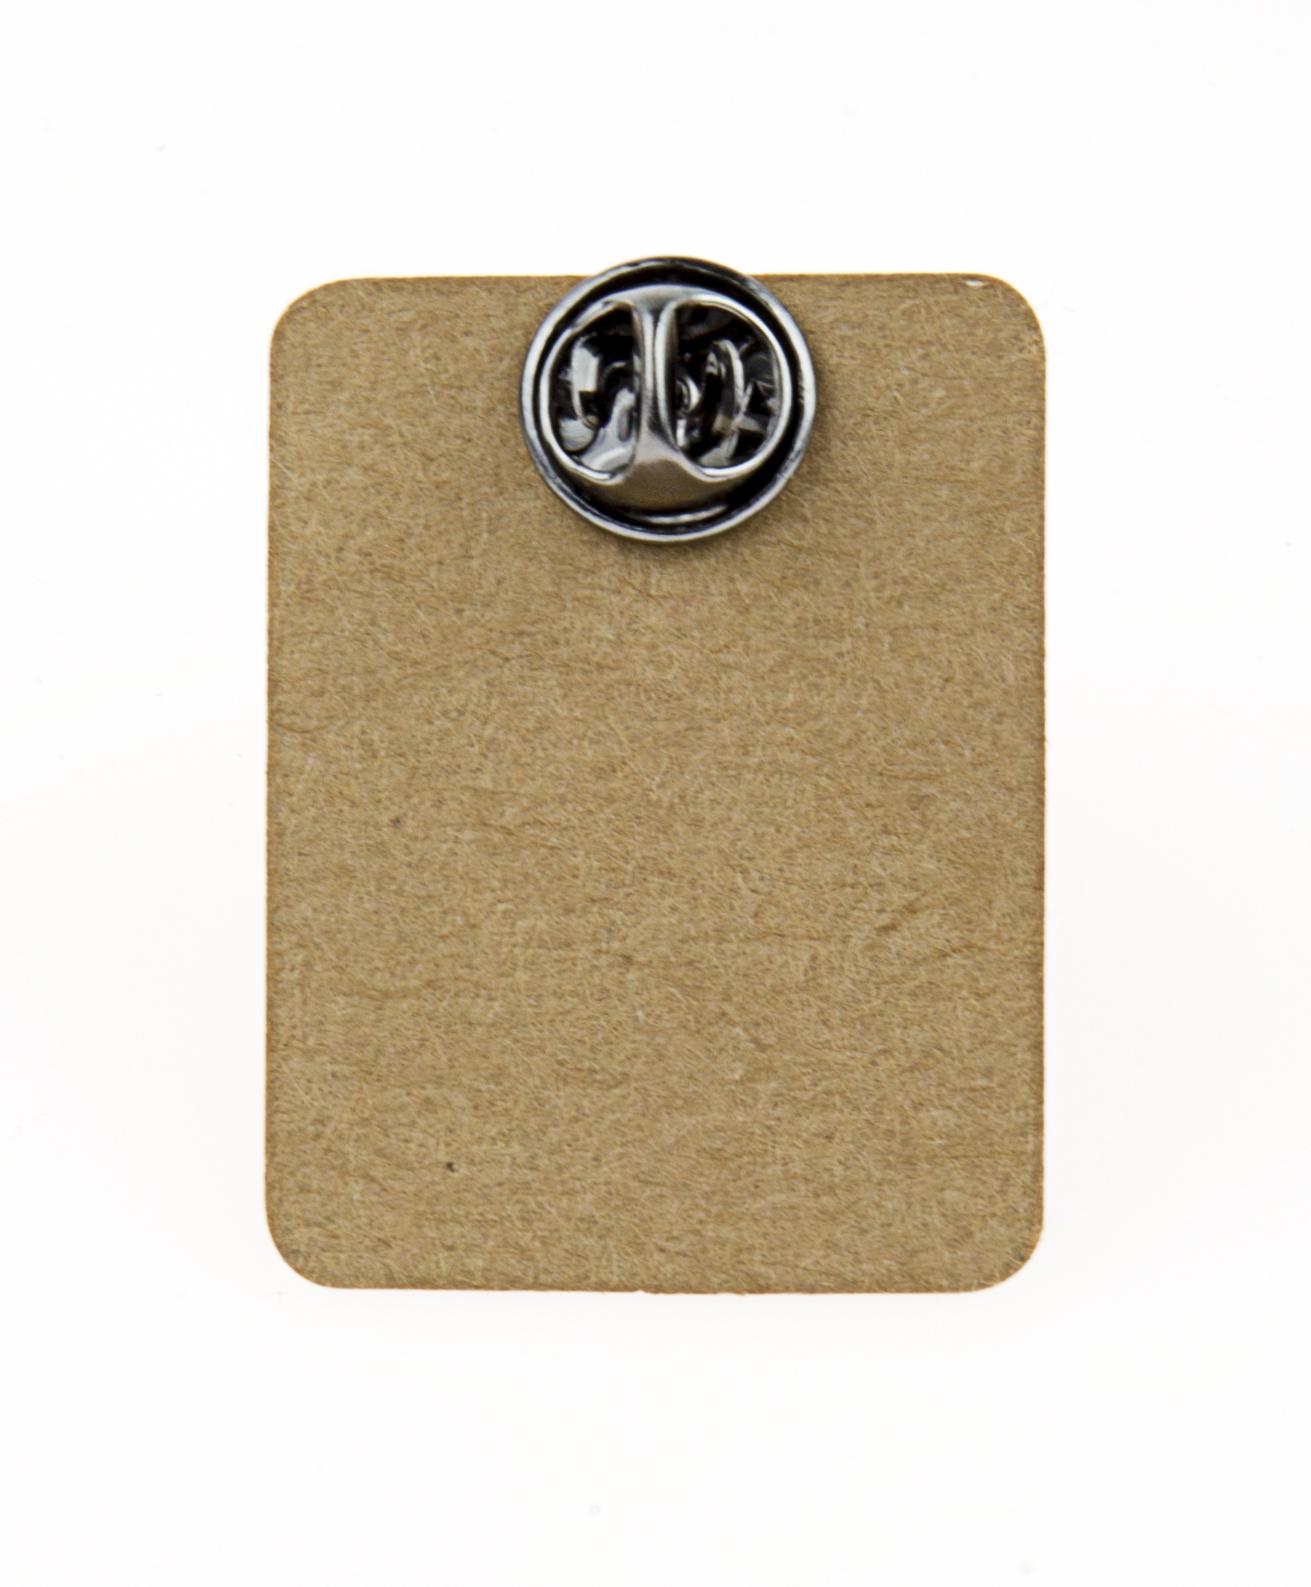 Metal Yin Yang Skull Enamel Pin Badge